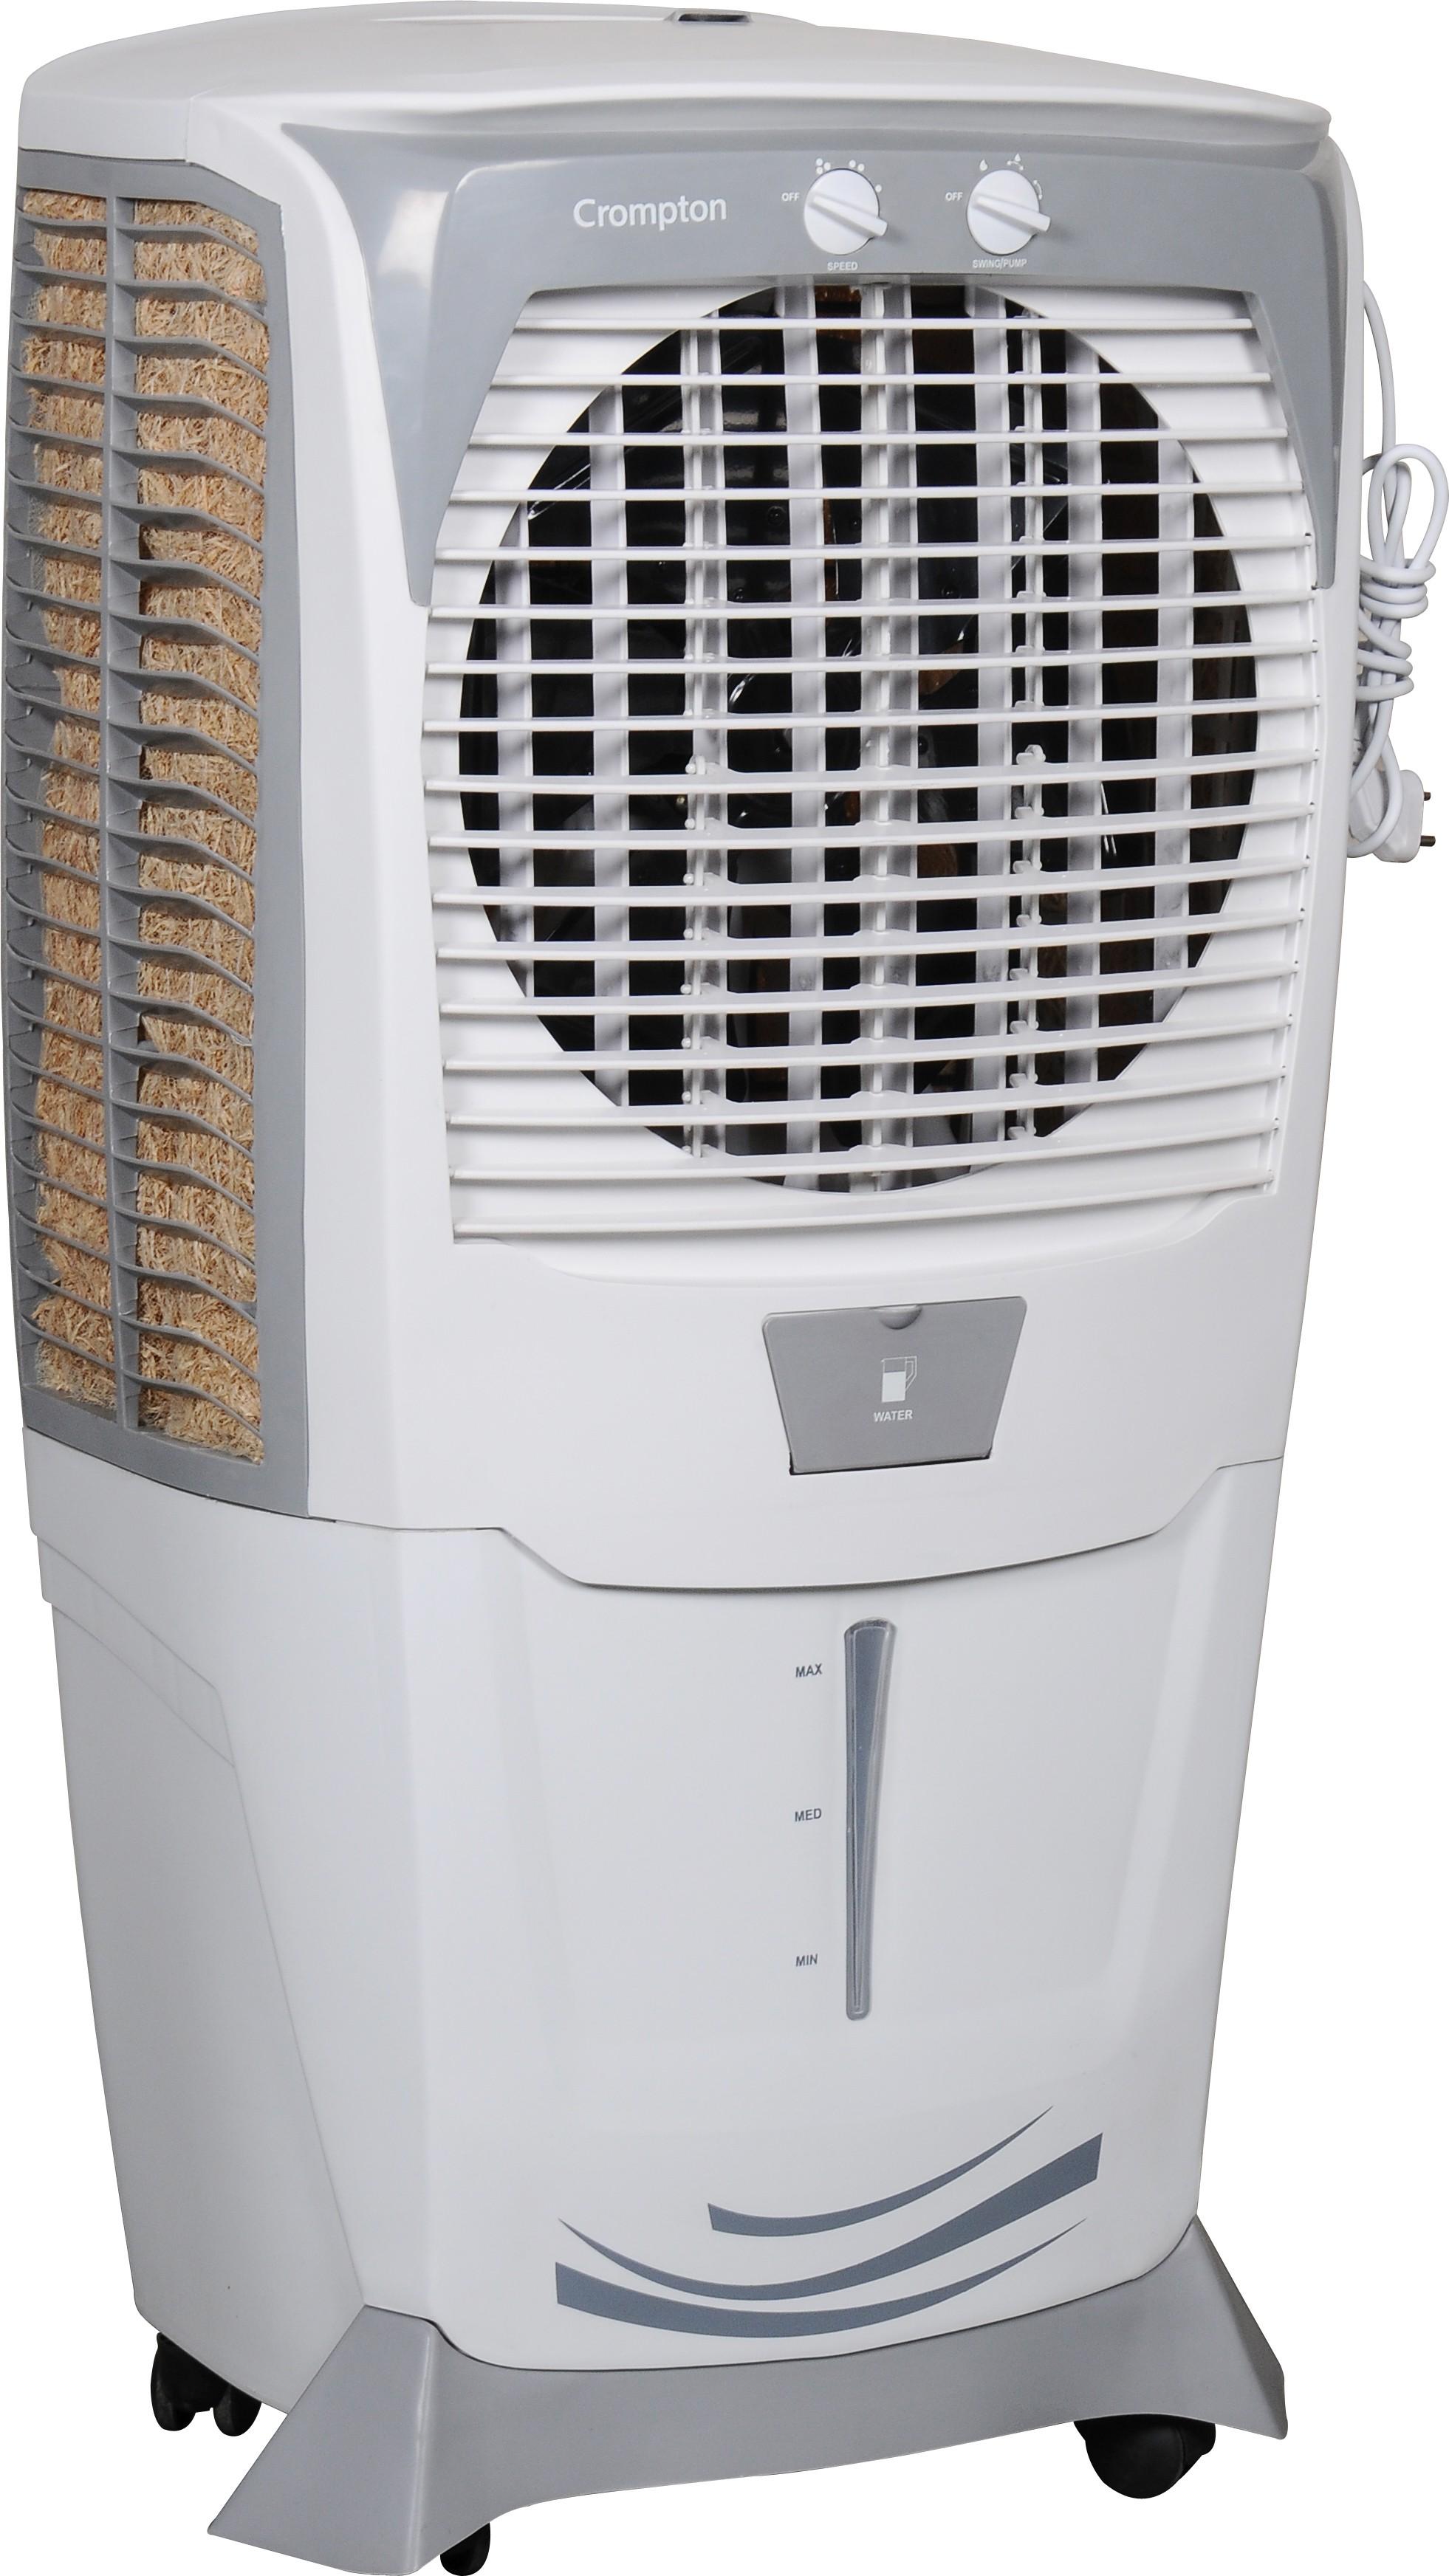 Crompton Ozone 75 Desert Air Cooler Image